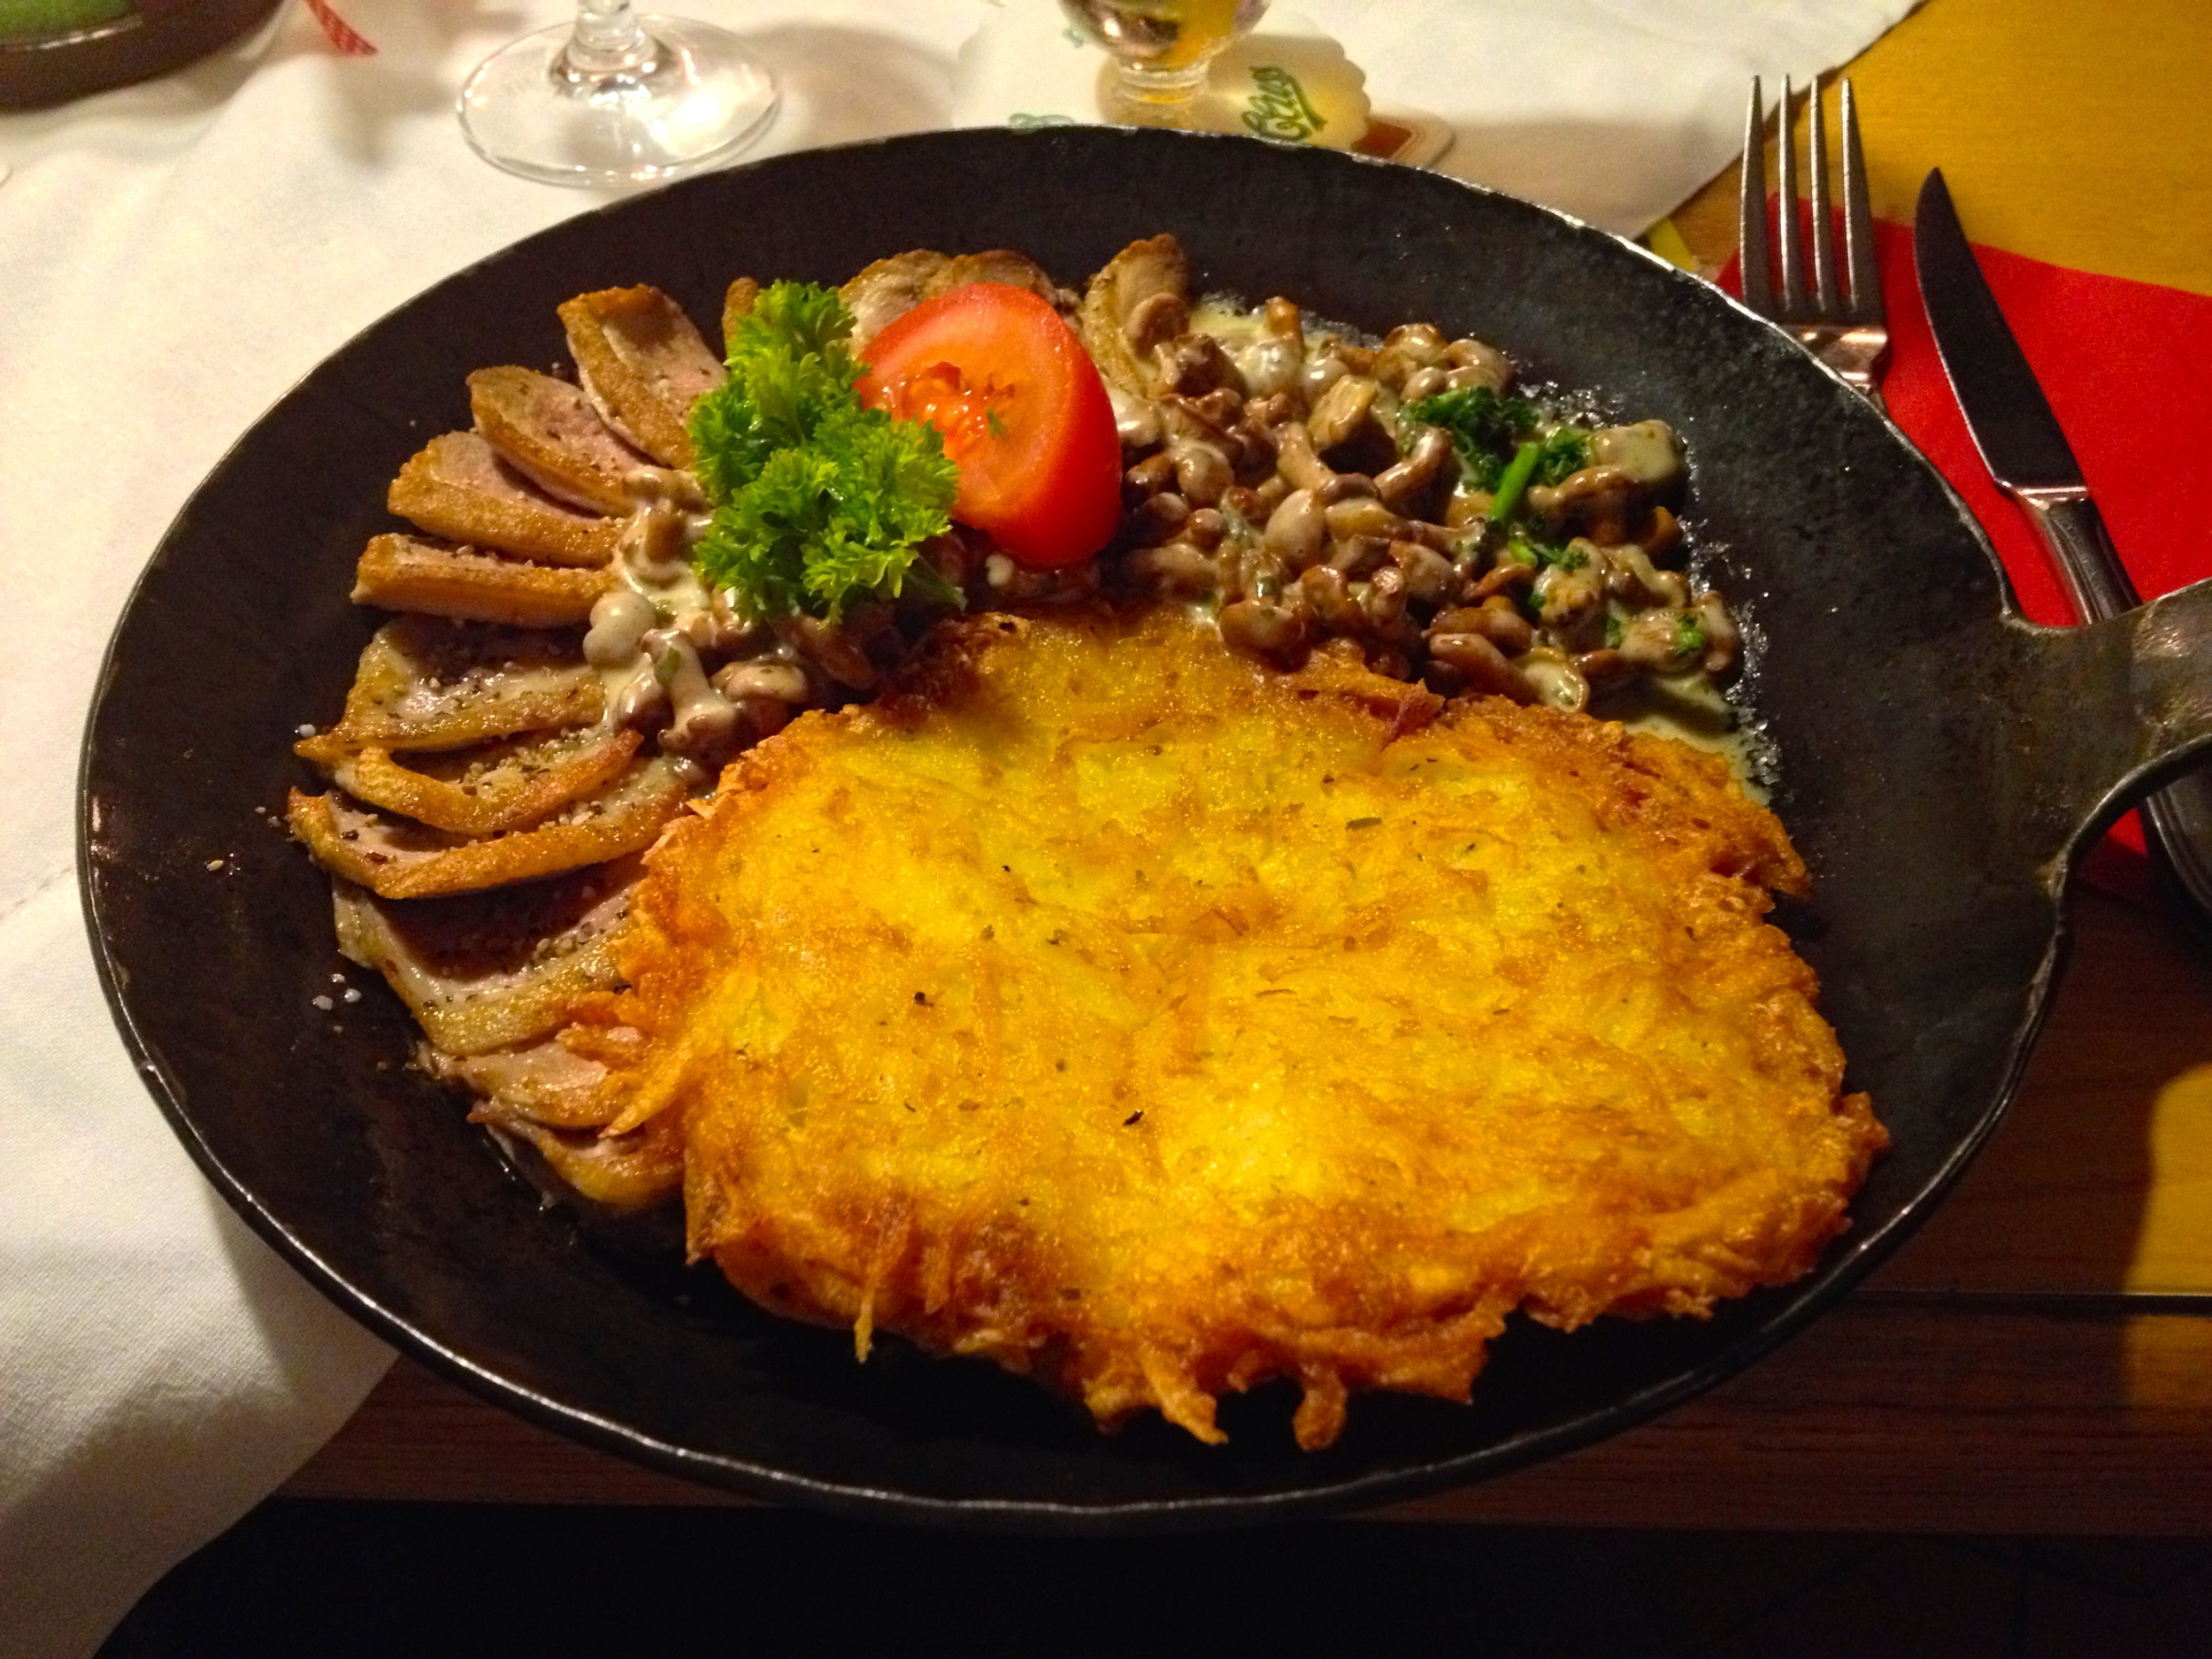 The duck pan with crispy duck, creamy mushrooms, and a potato pancake